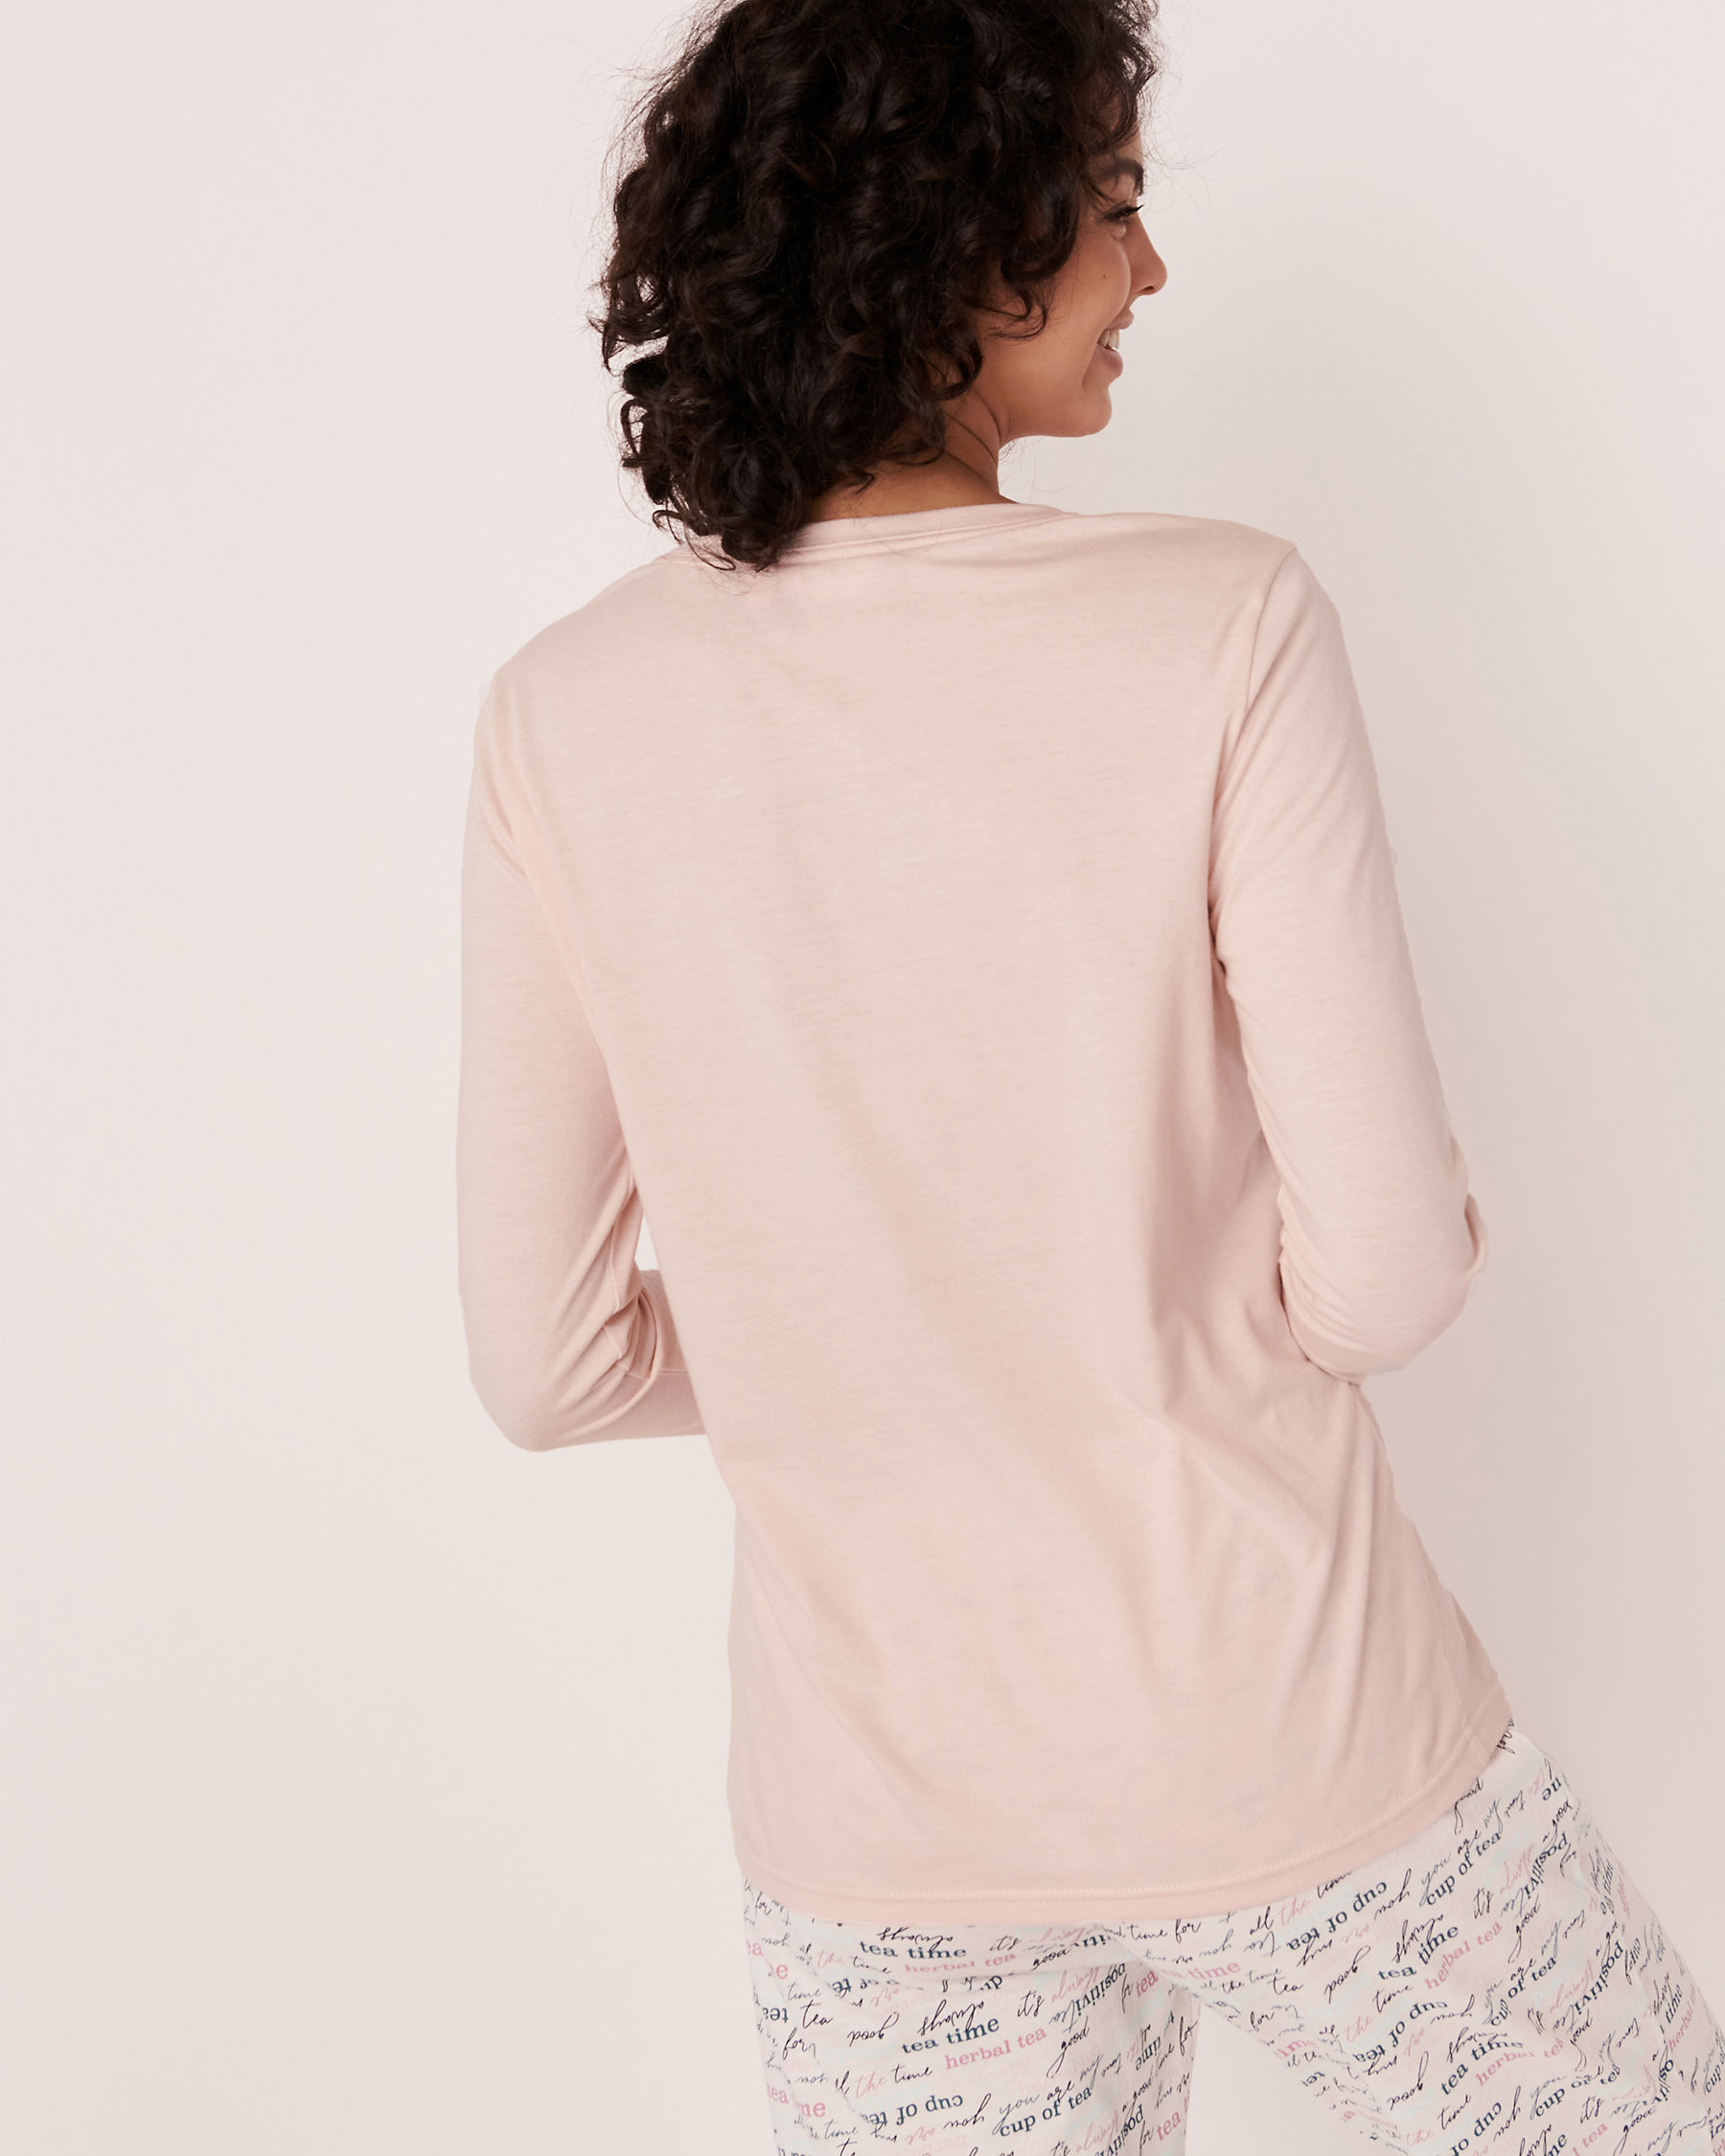 LA VIE EN ROSE Scoop Neck Long Sleeve Shirt Light pink 40100182 - View3